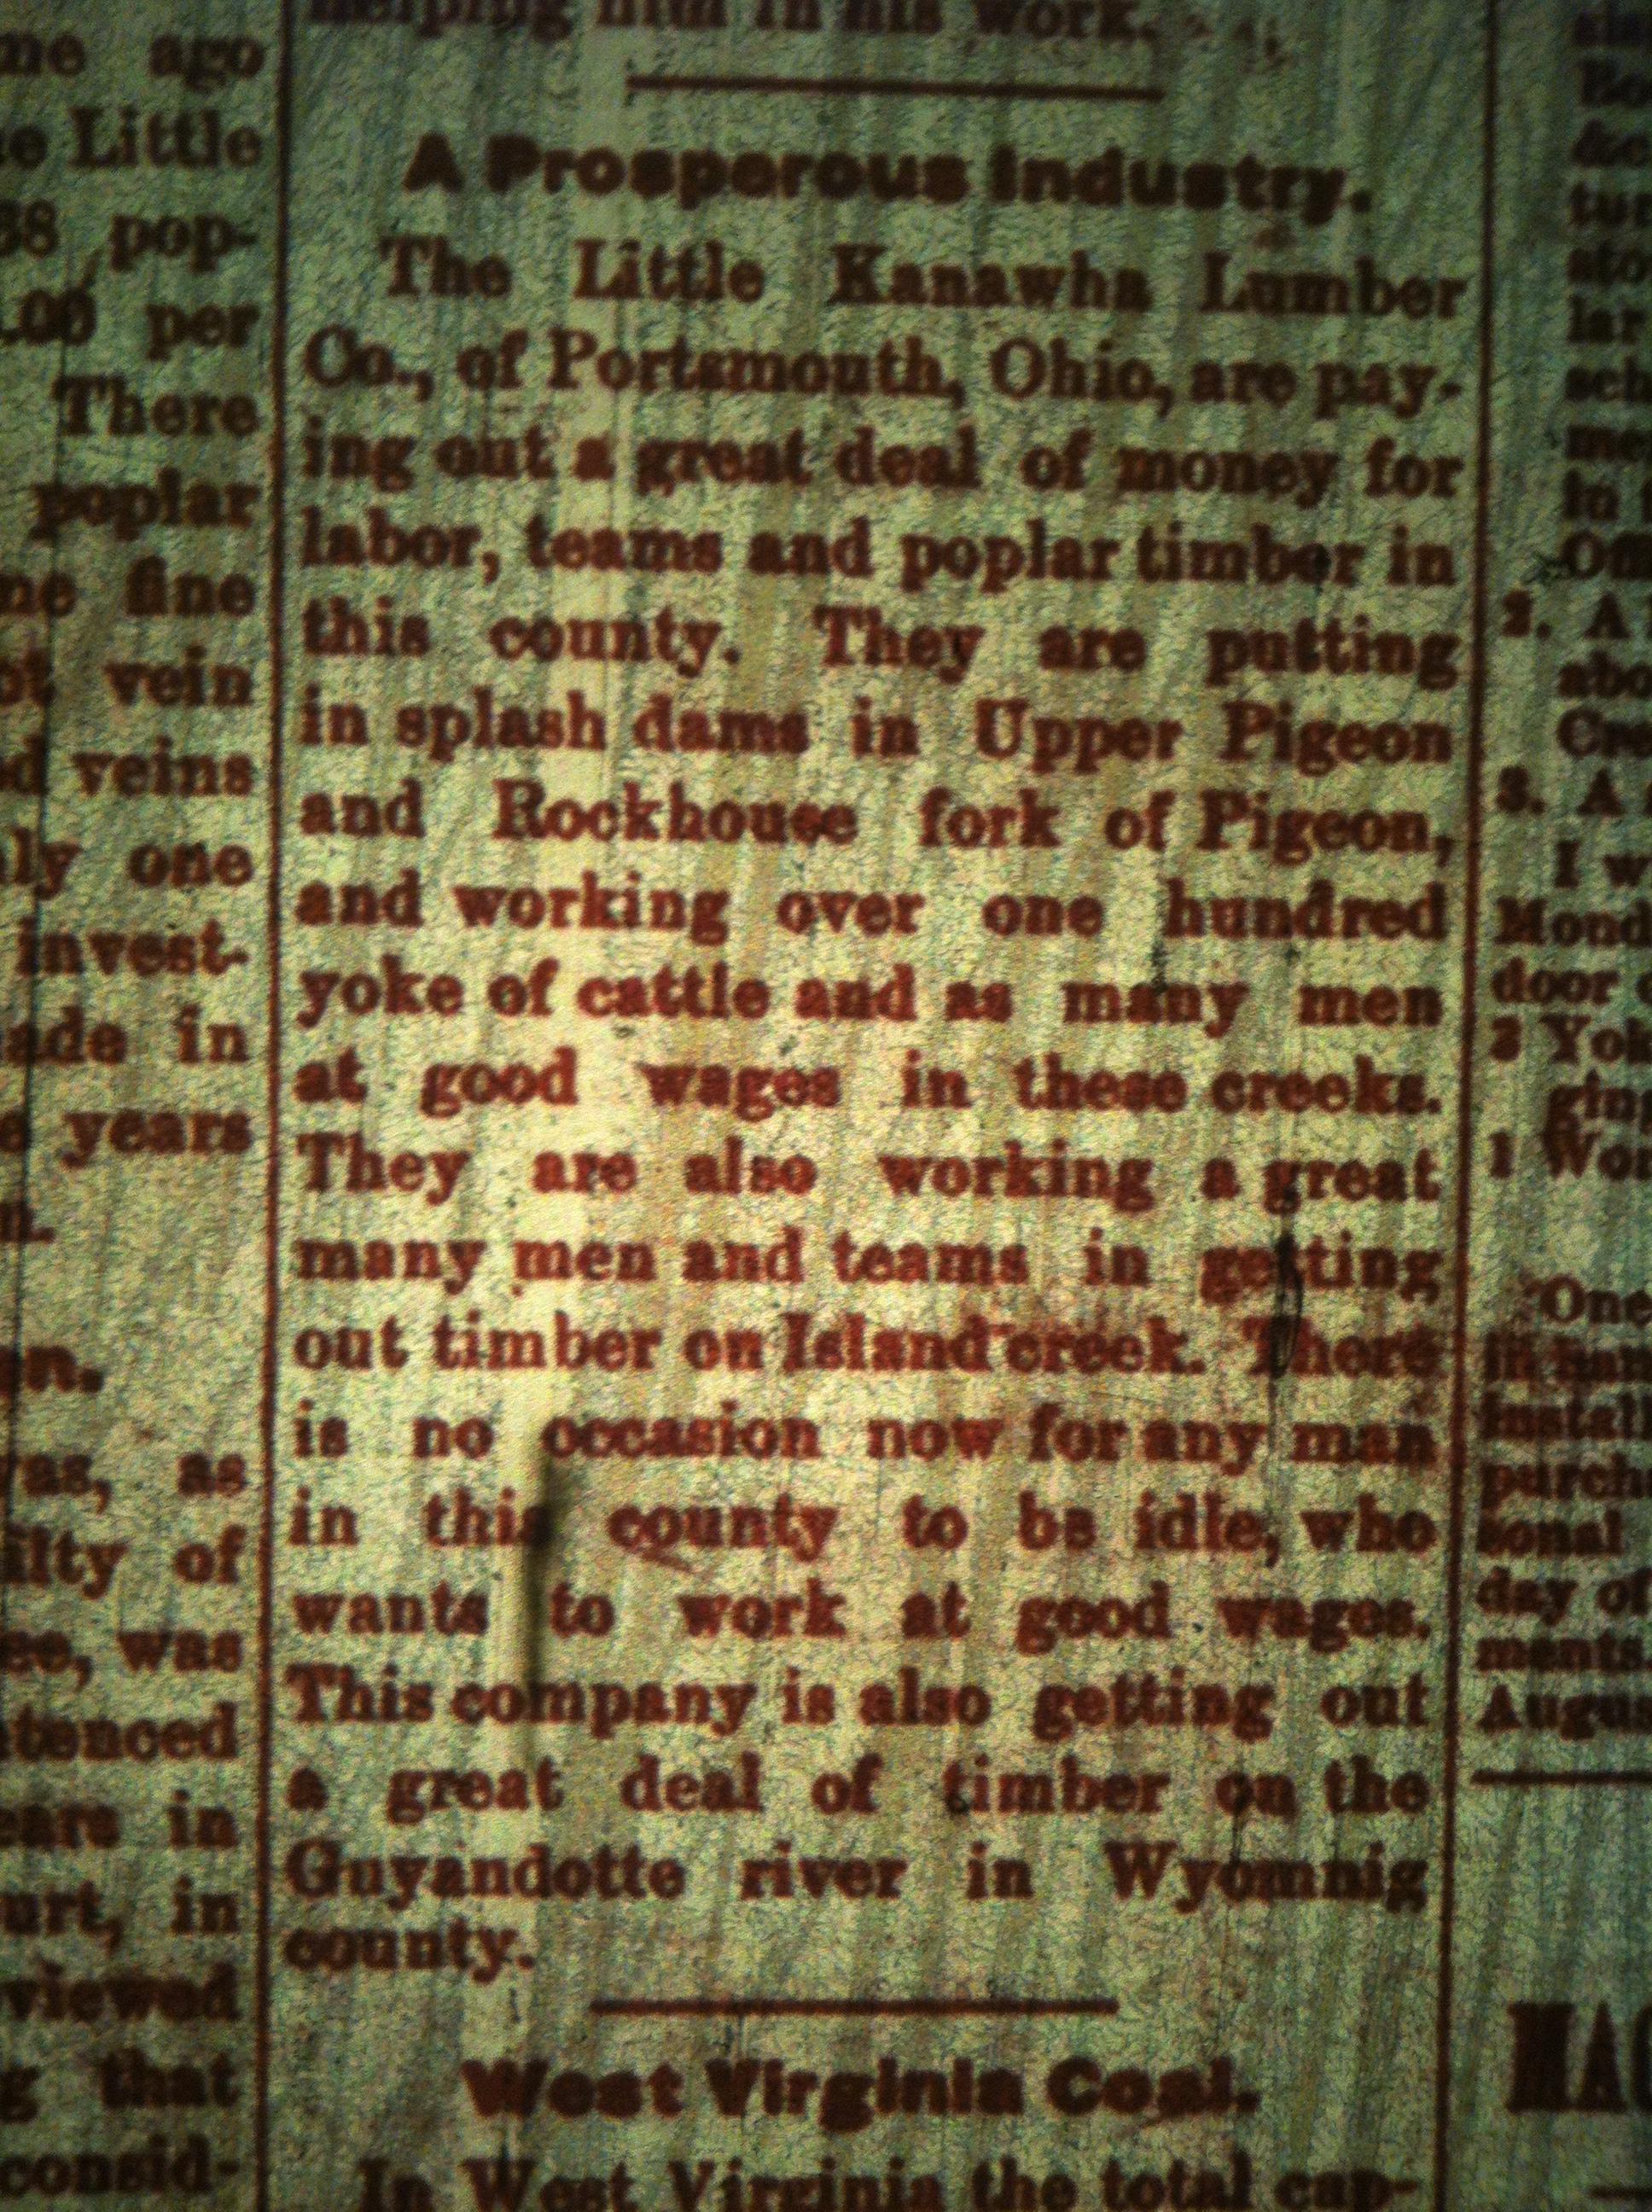 Little Kanawha Lumber Company LCB 08.06.1891.JPG